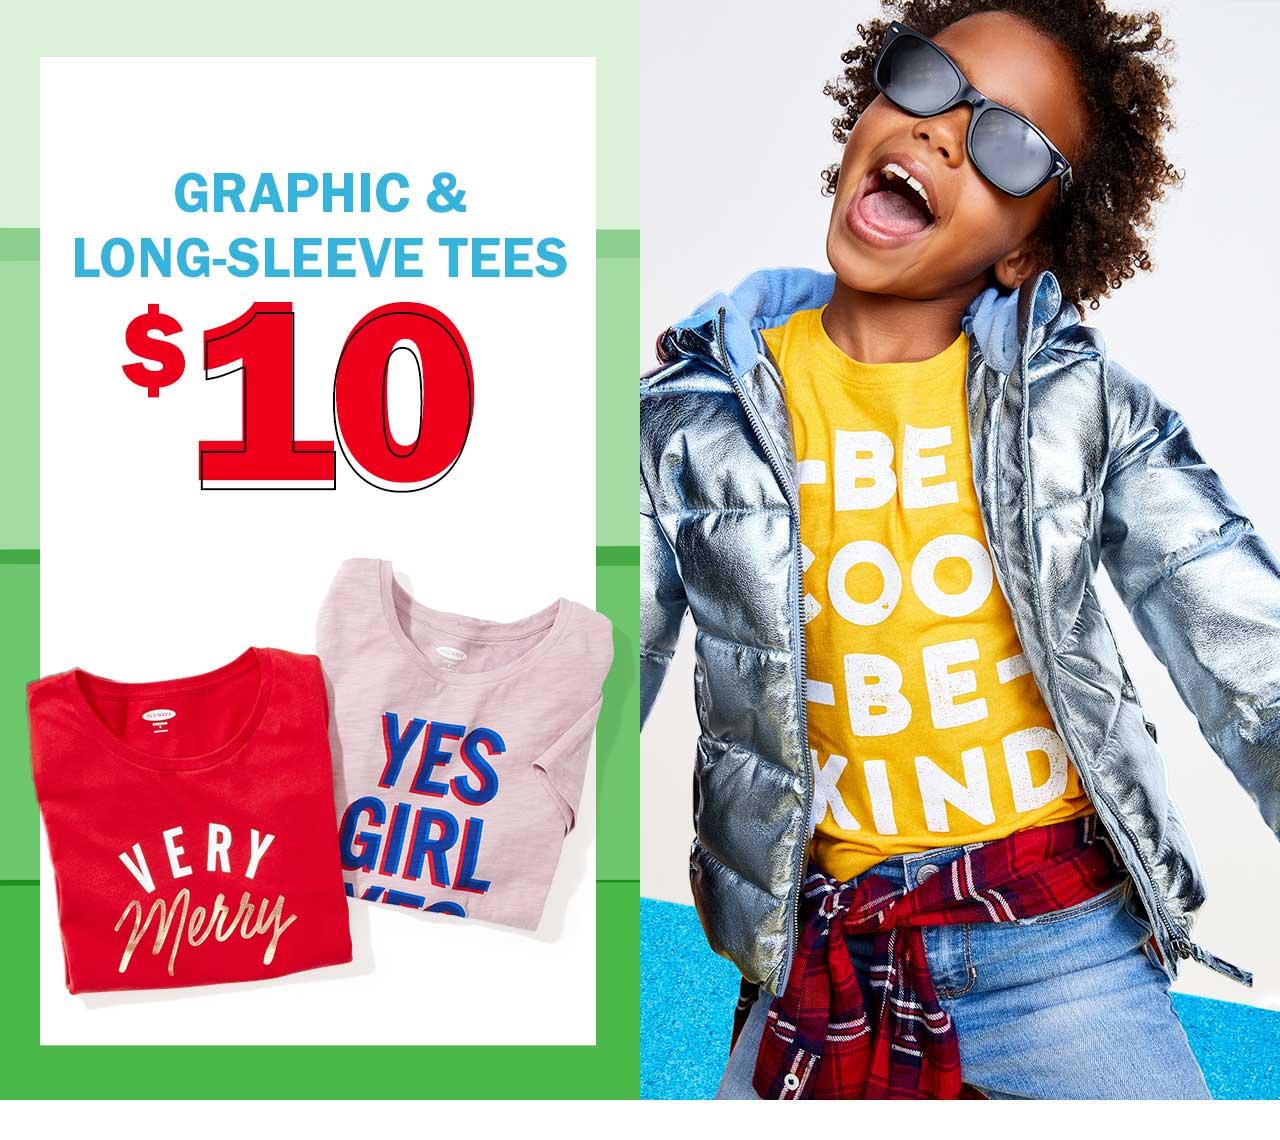 Graphic & long-sleeve tees $10